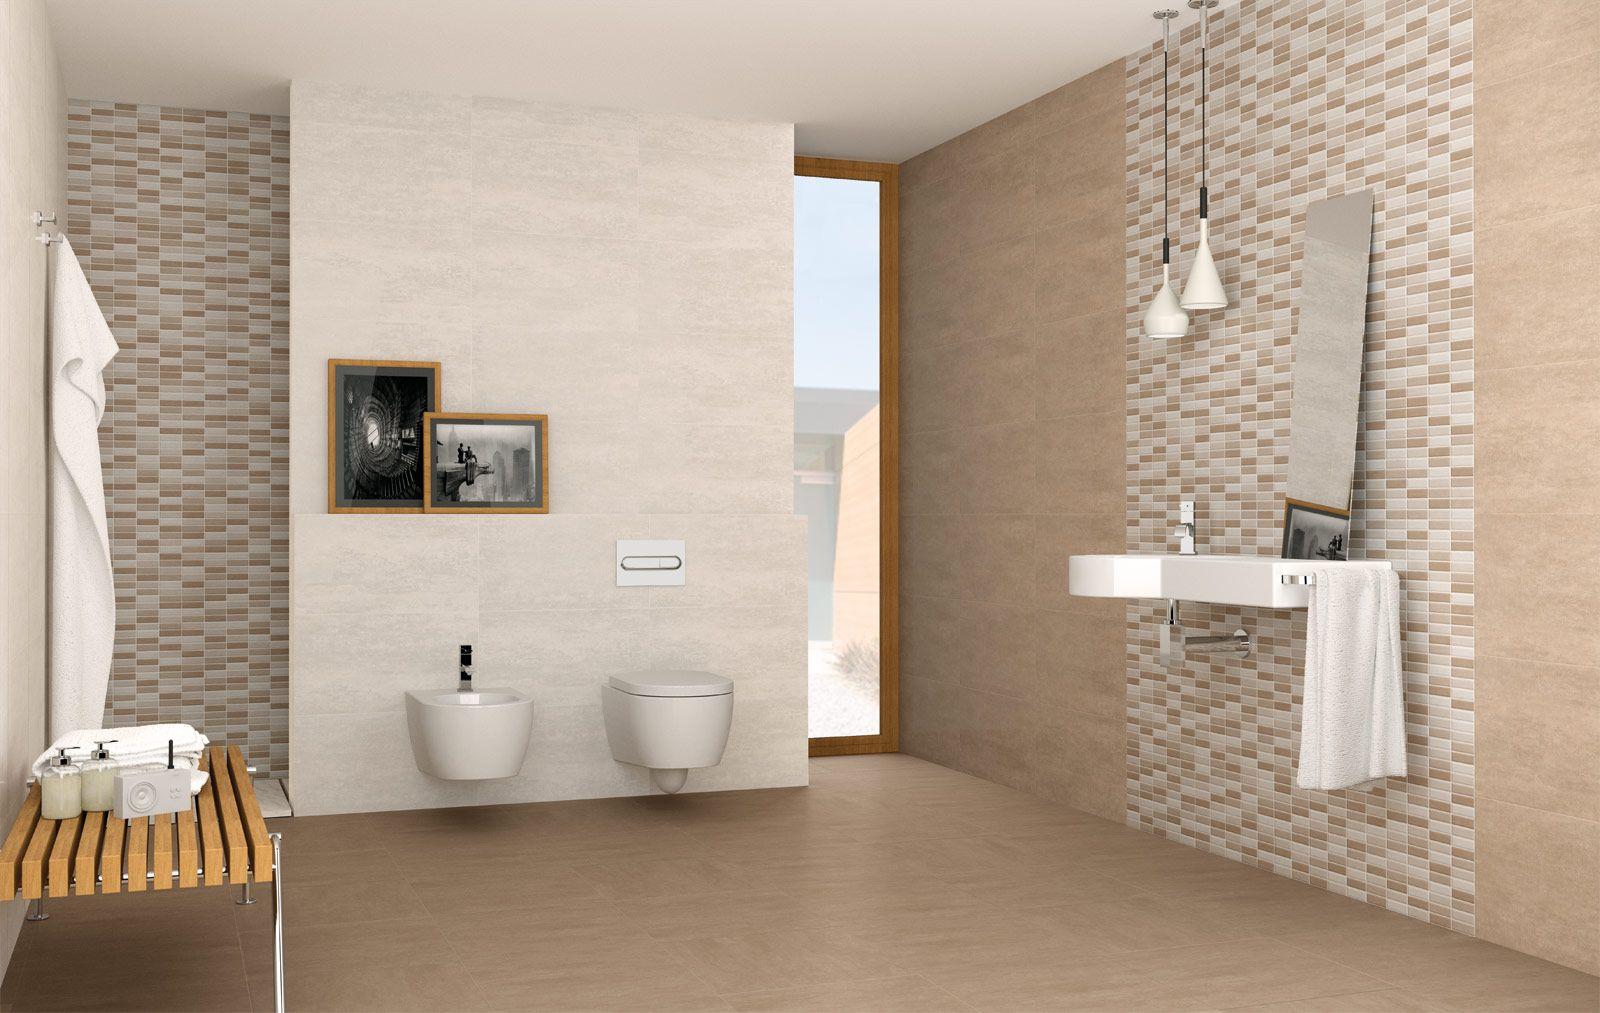 Marazzi Serpal Beige 33x60 Cm Dawj Bathroom Wall Tile Wall Tiles Elegant Bathroom